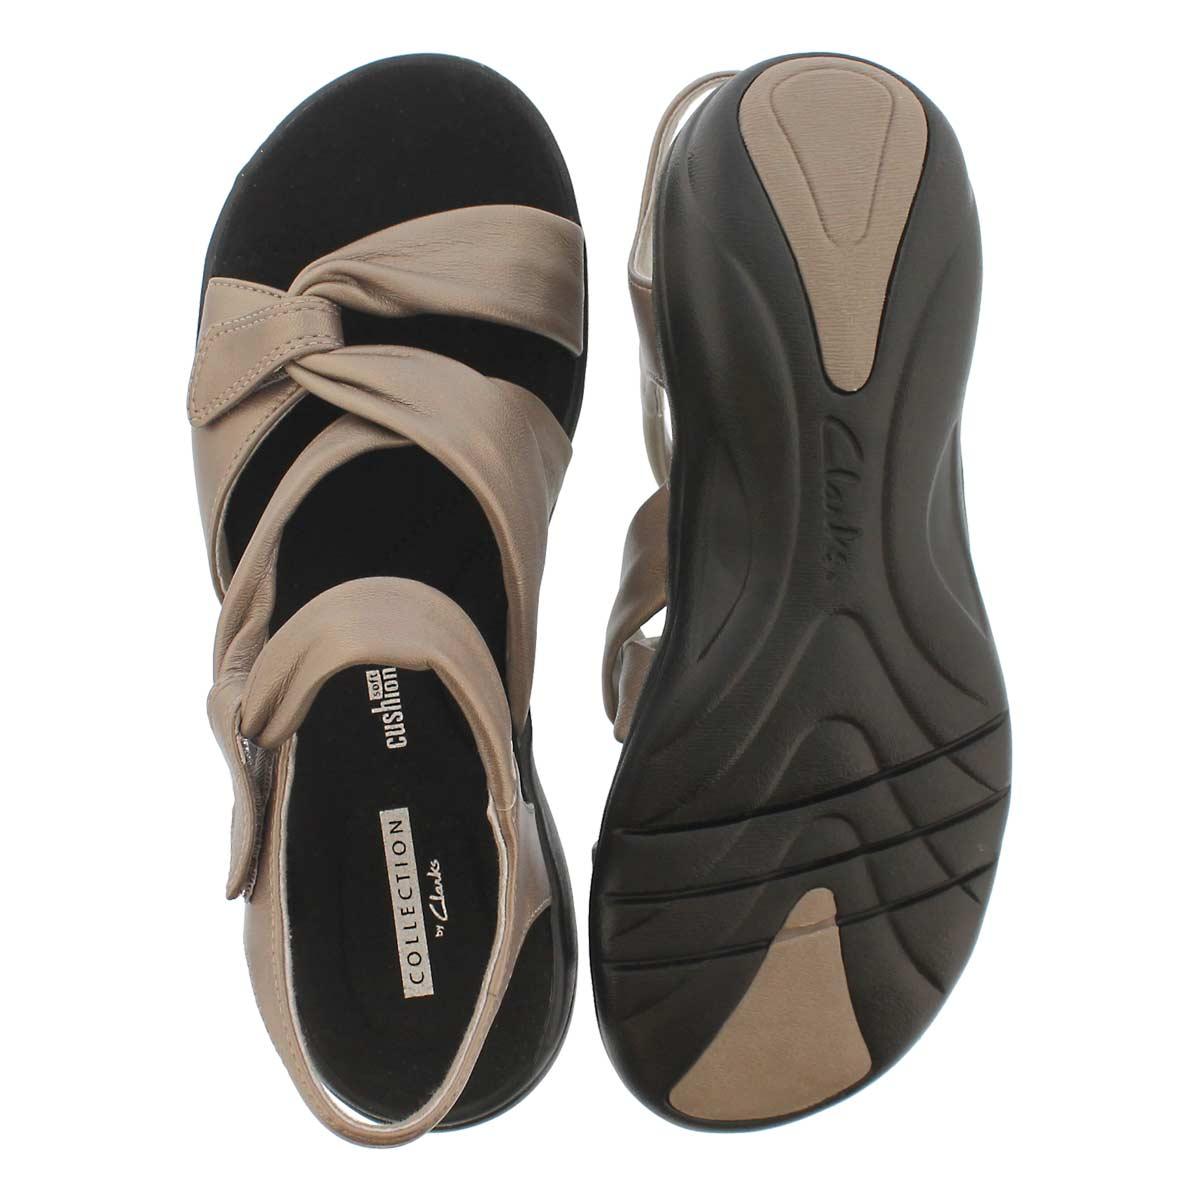 Lds Saylie Moon pwtr mtlc casual sandal